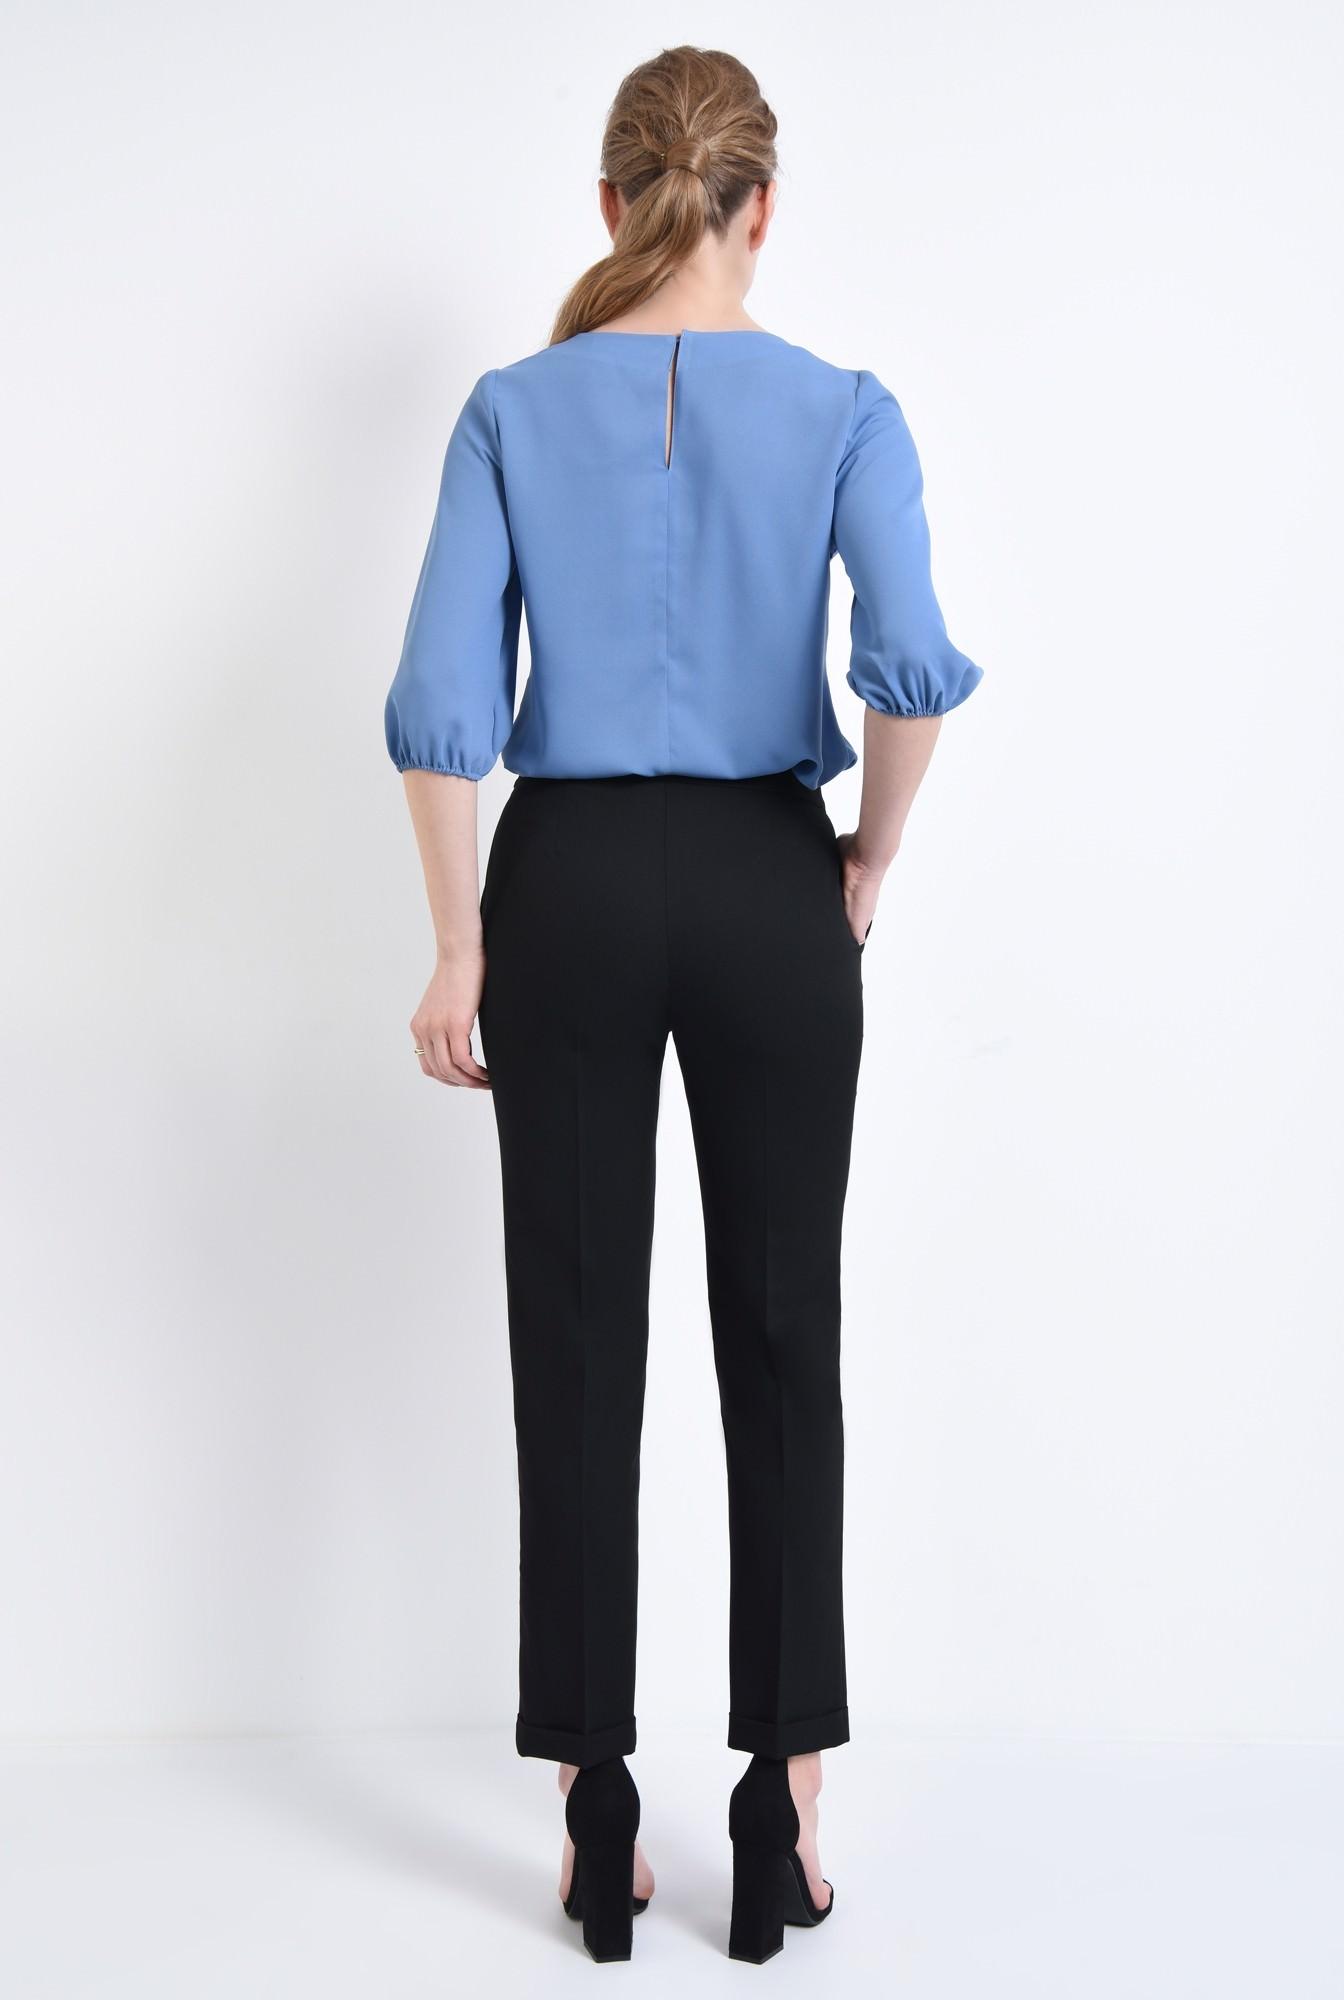 1 - 360 - Pantaloni la dunga, cu mansete, betelie